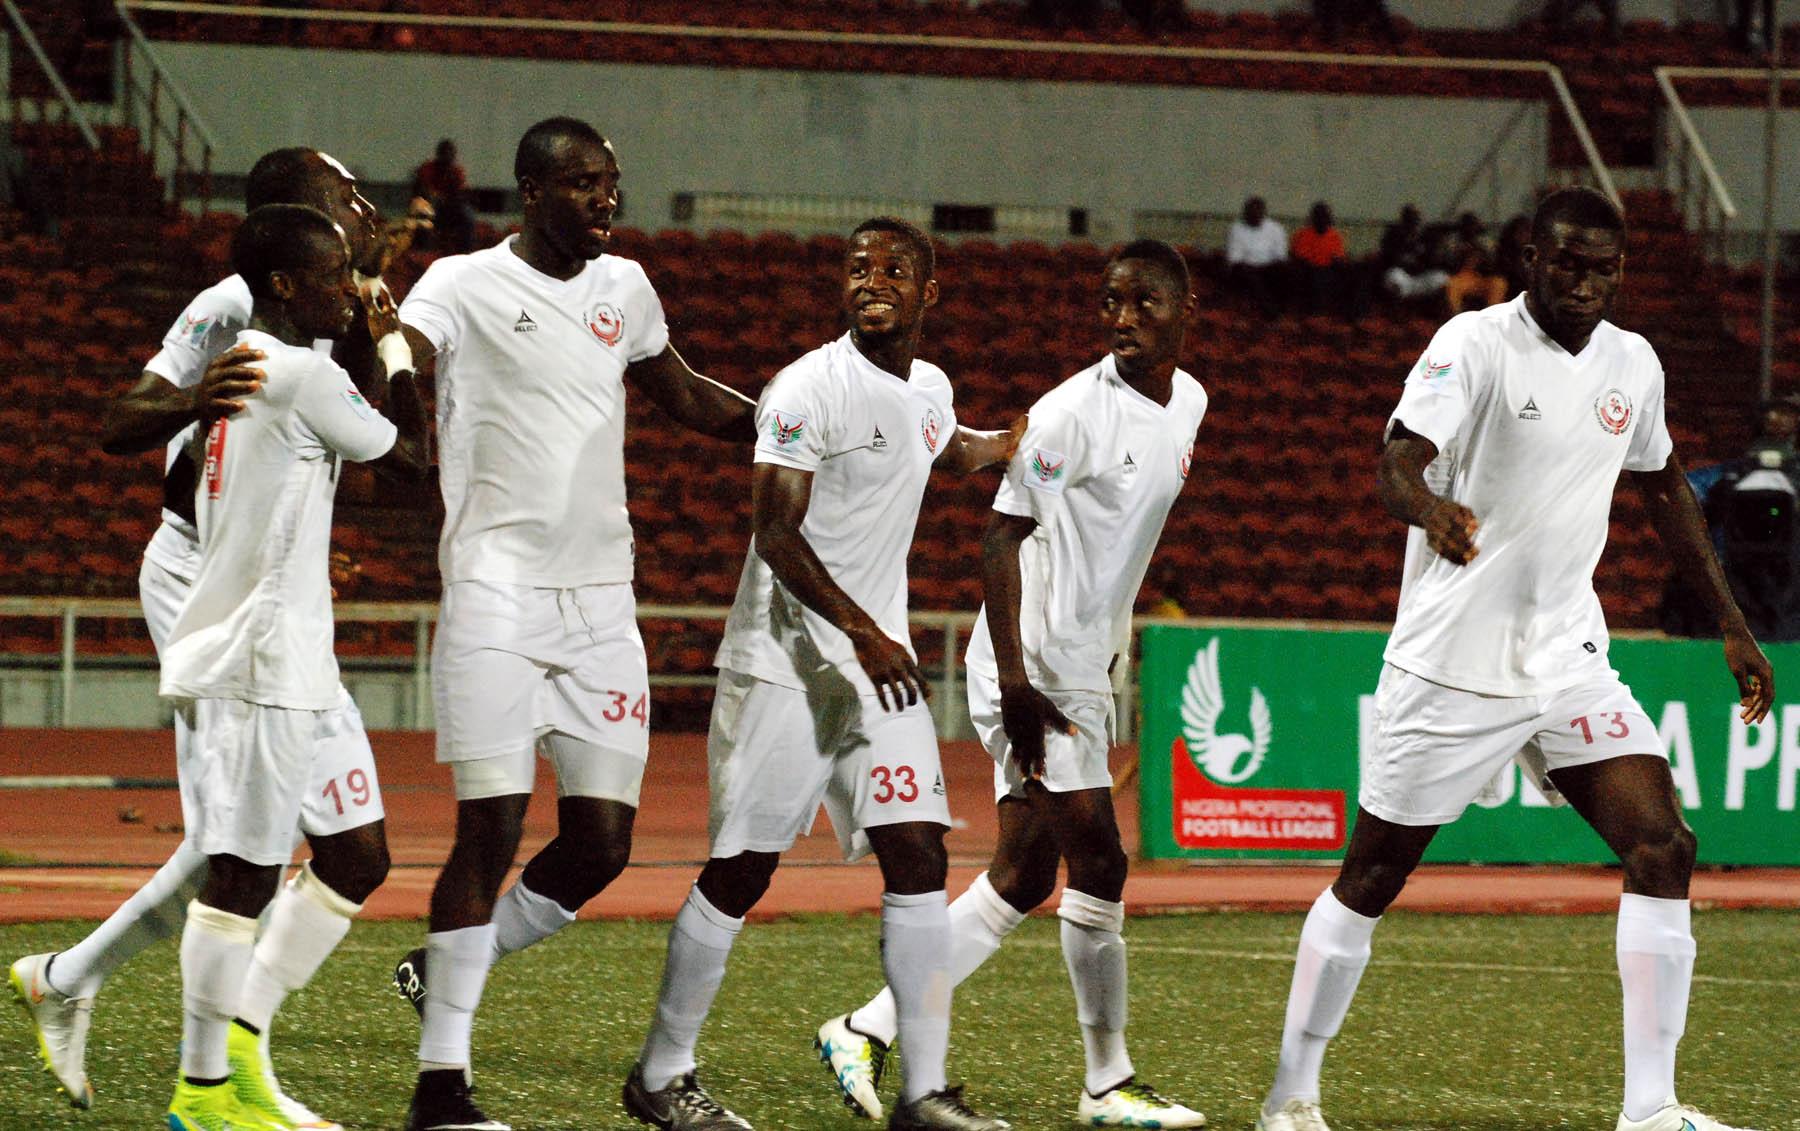 NPFL: Rangers, IfeanyiUbah In Oriental Clash,3SC Host El-Kanemi